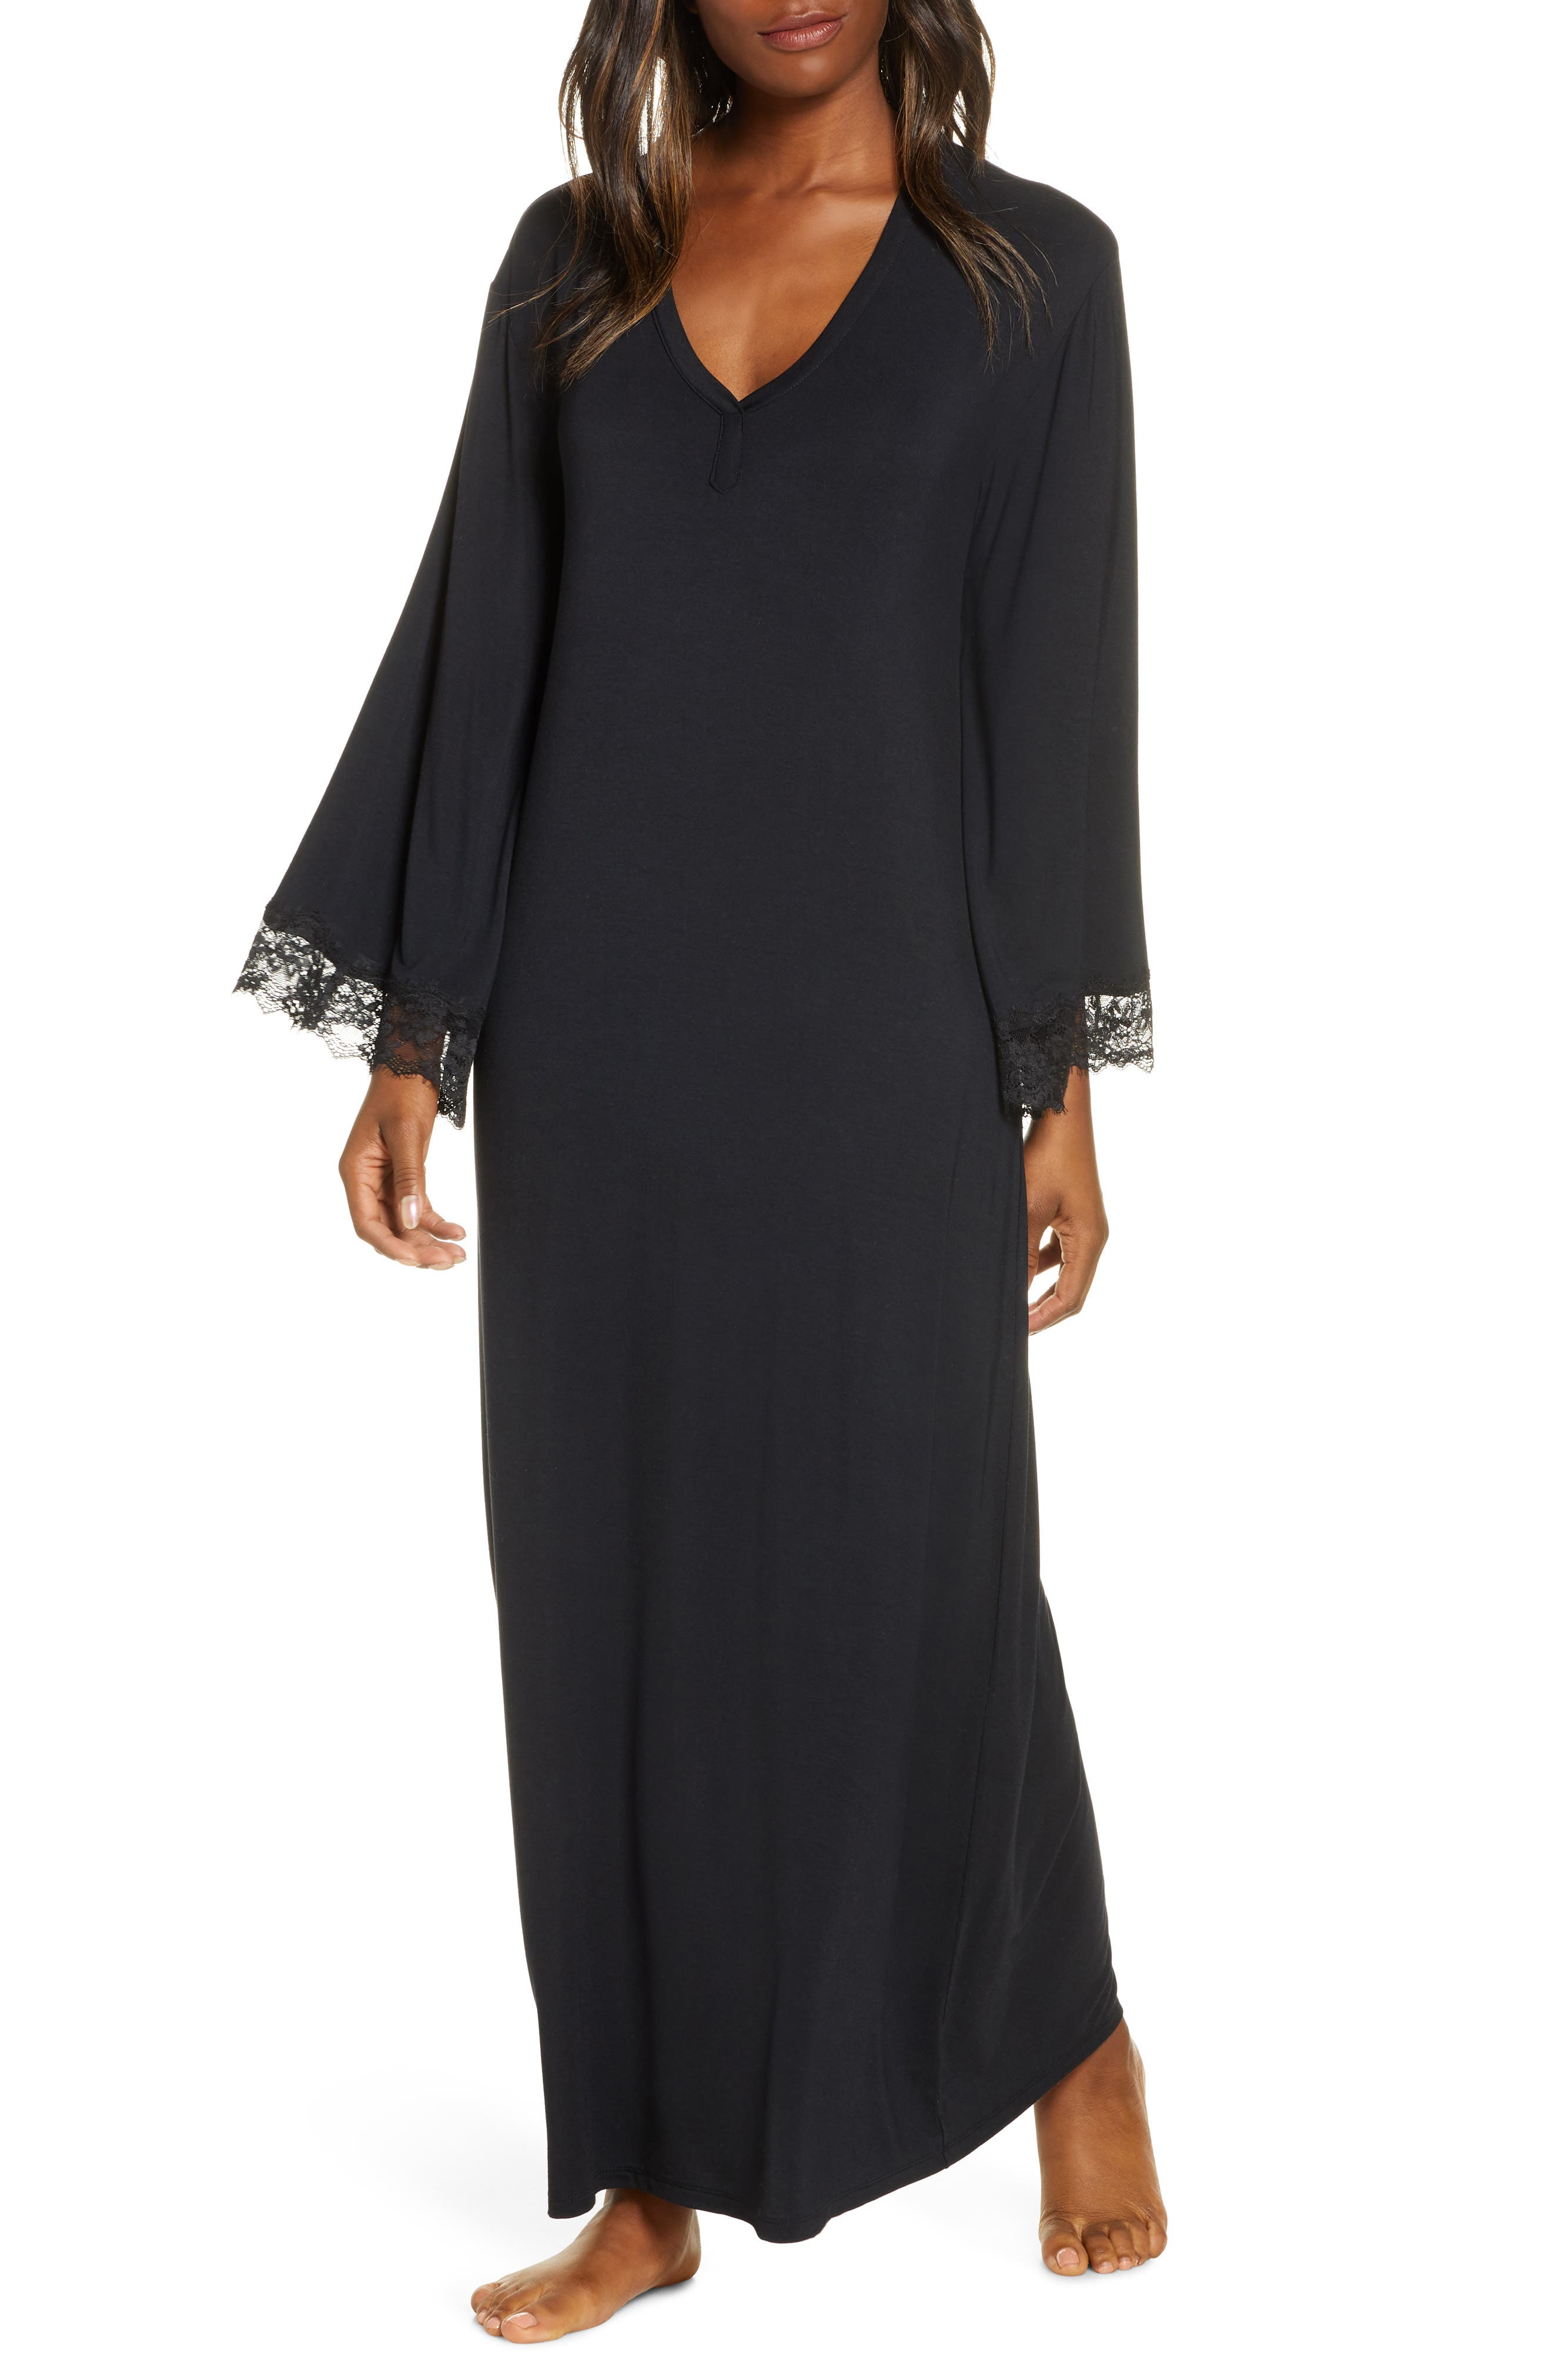 1920s Evening Dresses & Formal Gowns Womens Nordstrom Lace Trim Knit Caftan $75.00 AT vintagedancer.com